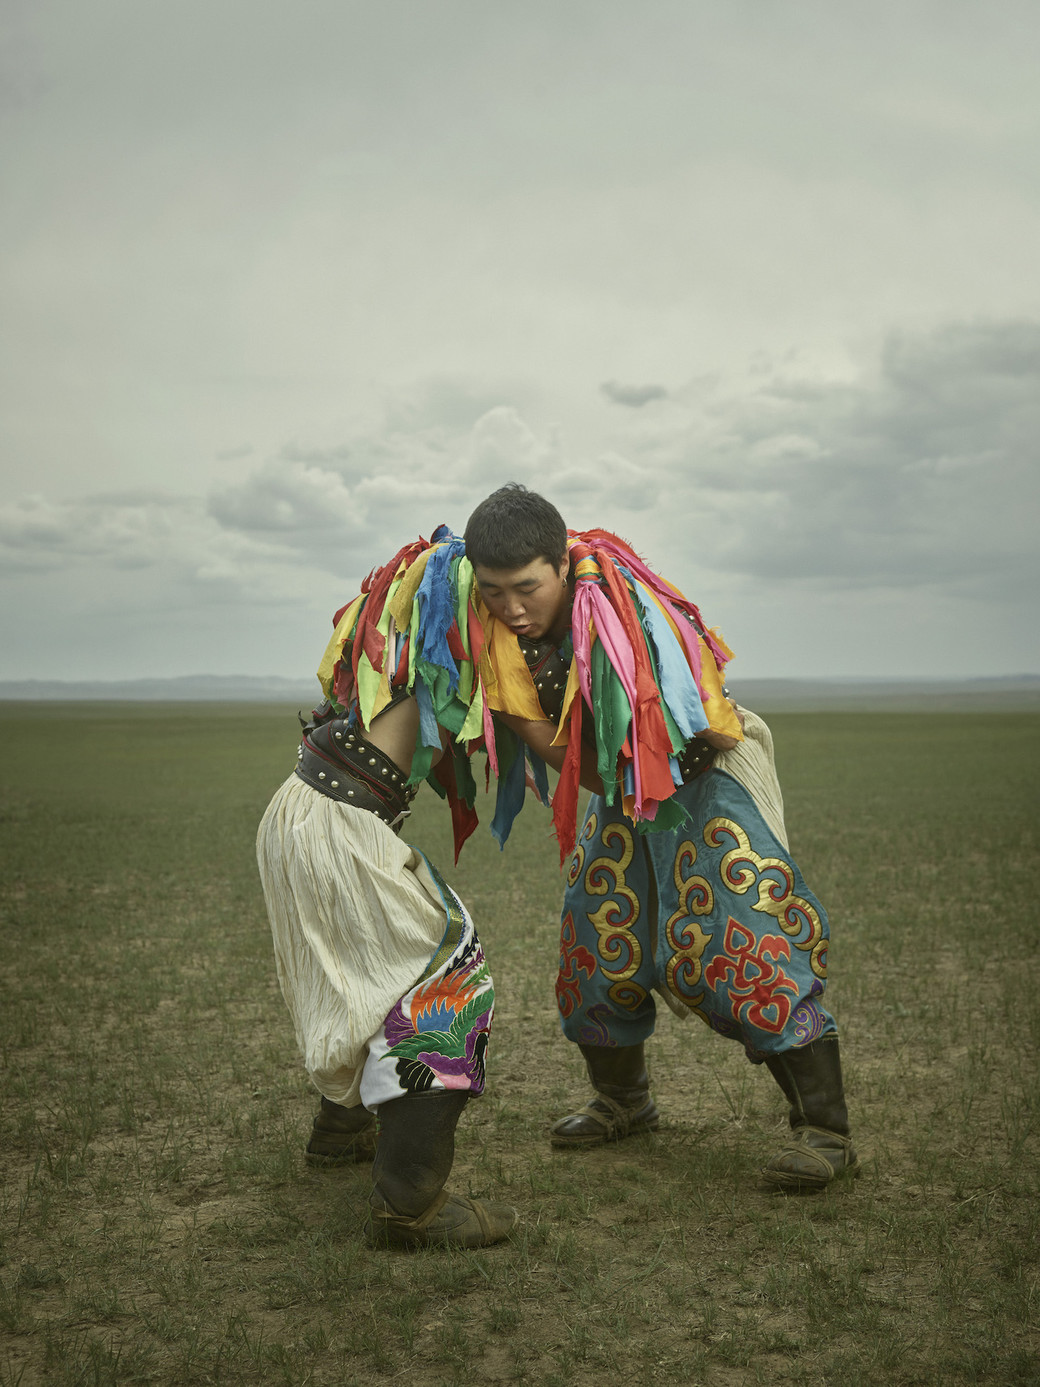 wrestling Mongolia two men grappling